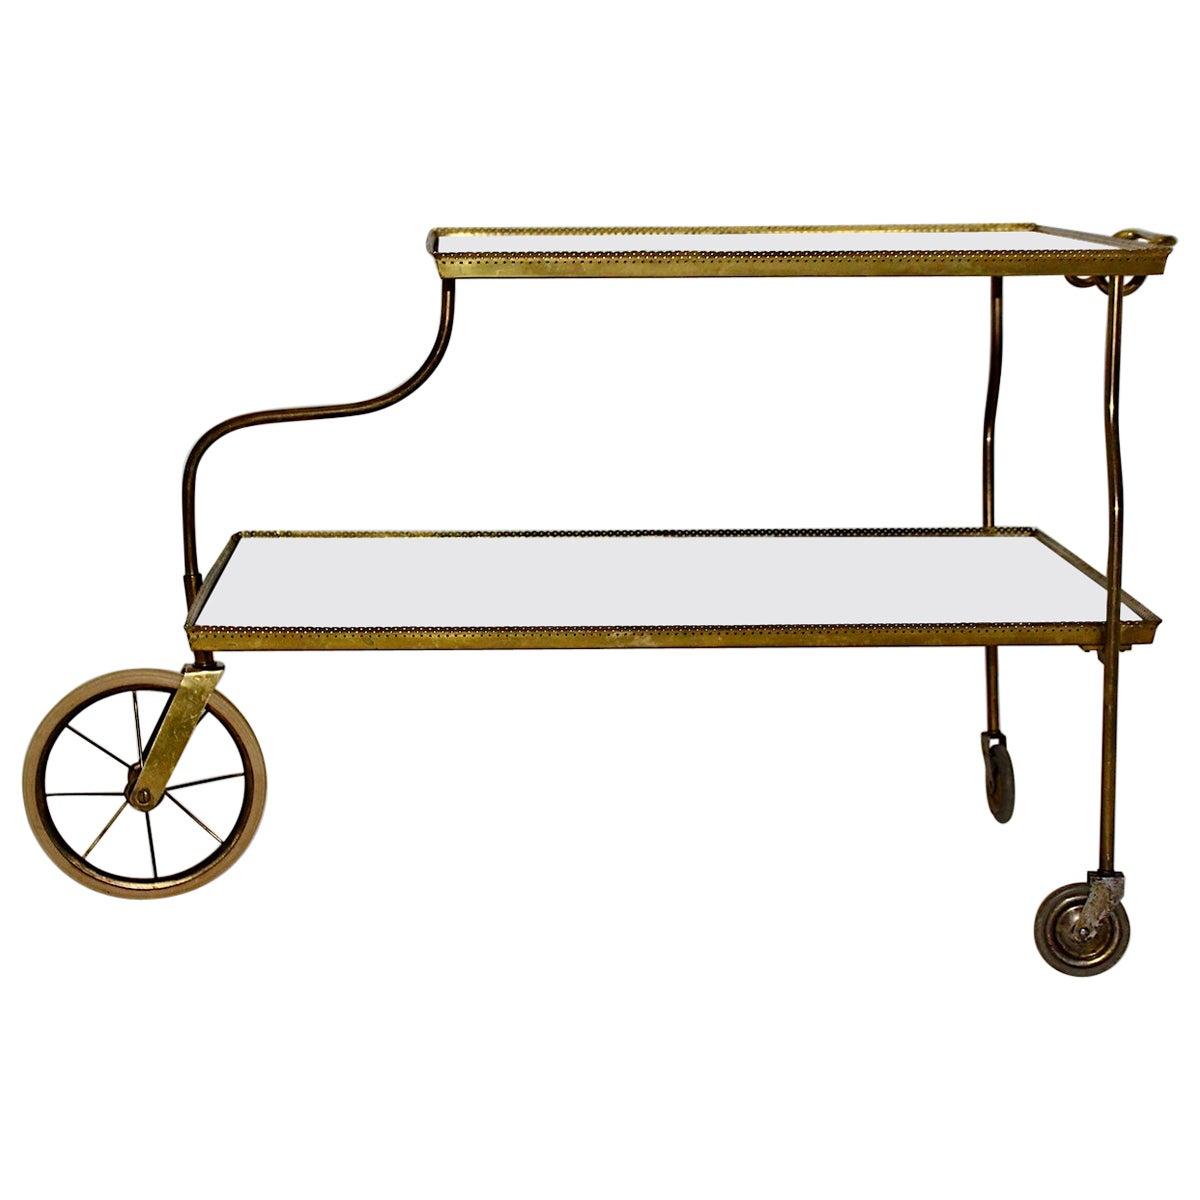 Brass Vintage Bar Cart by Josef Frank for Svenskt Tenn, circa 1938, Sweden